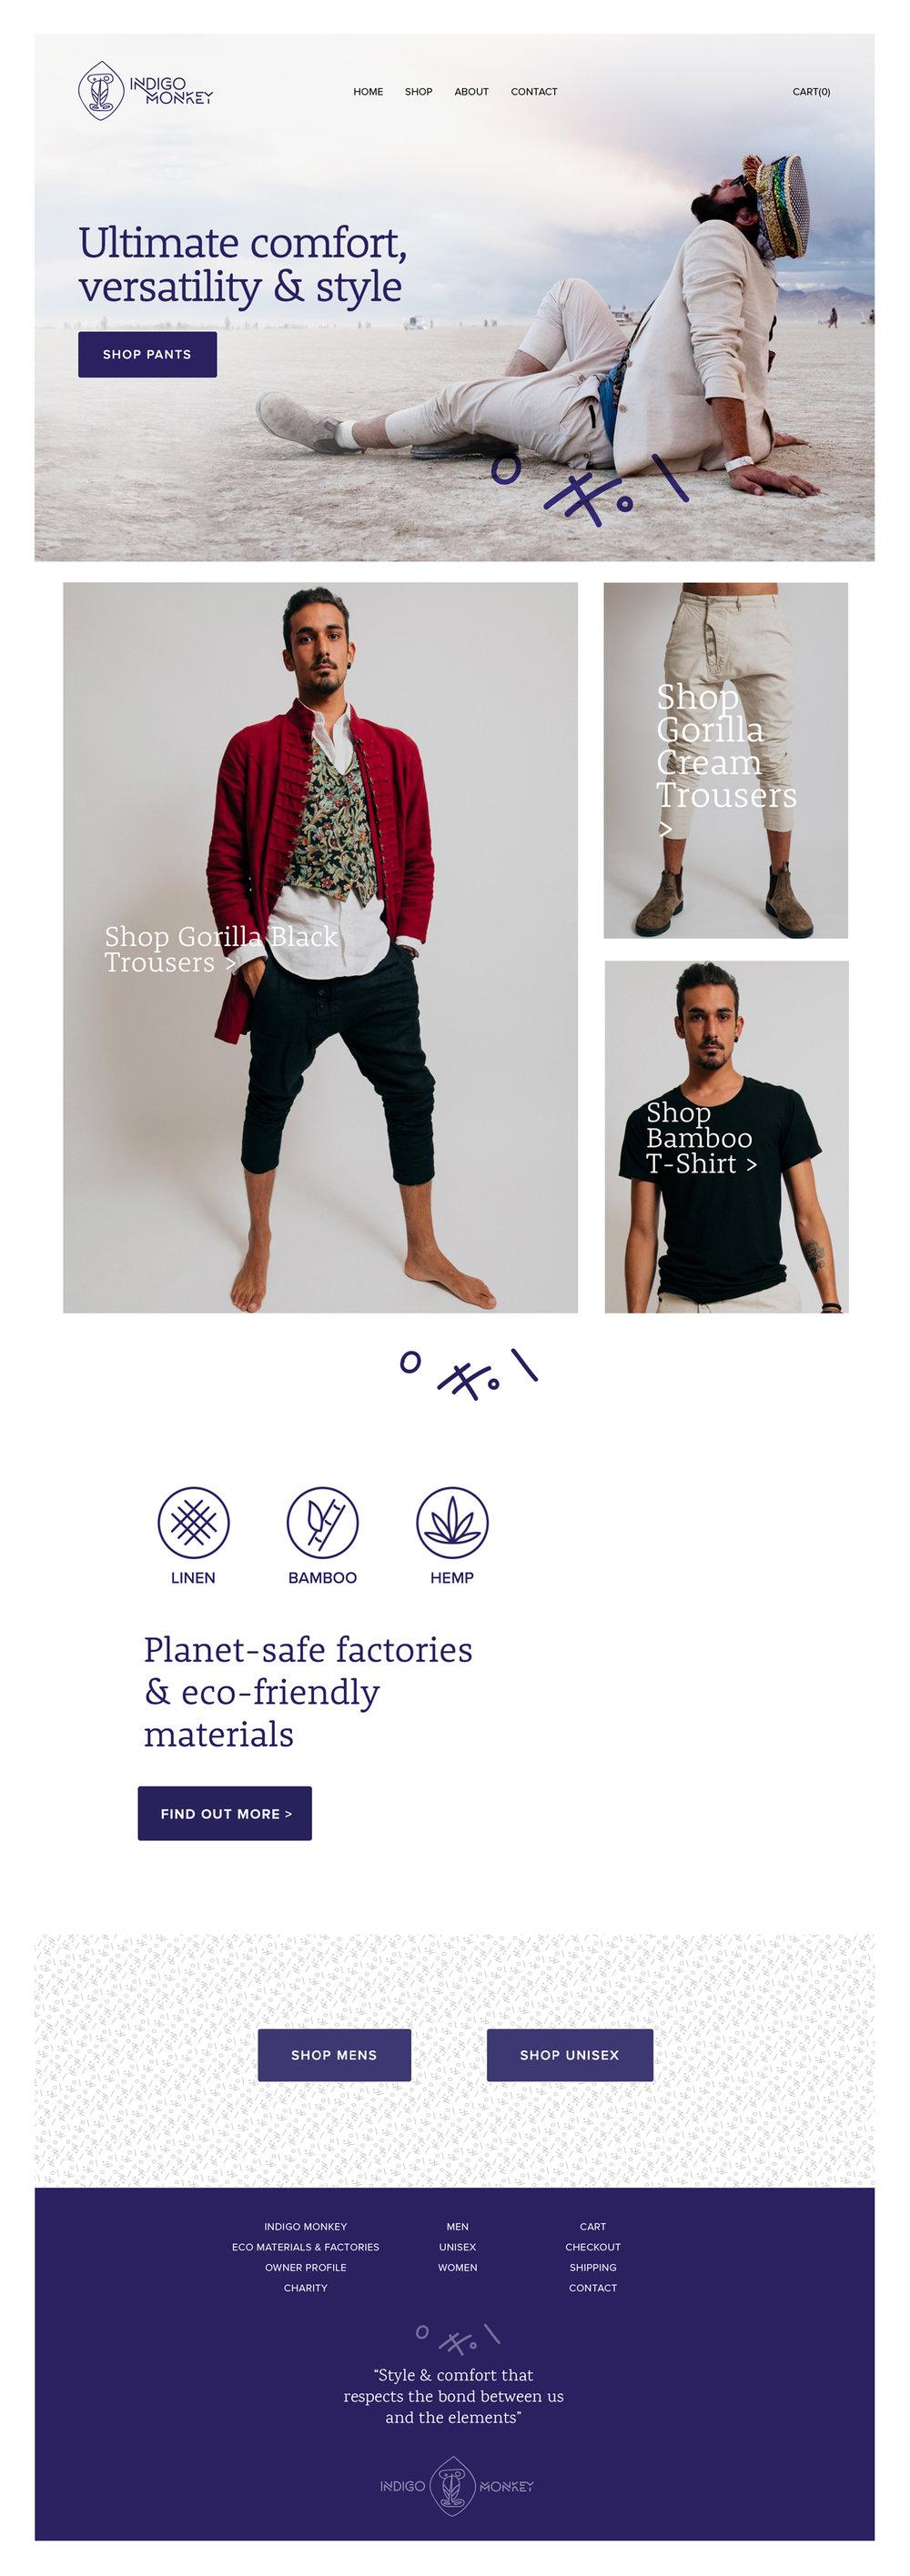 1131-Indigo-Monkey#22-B2-pants.jpg